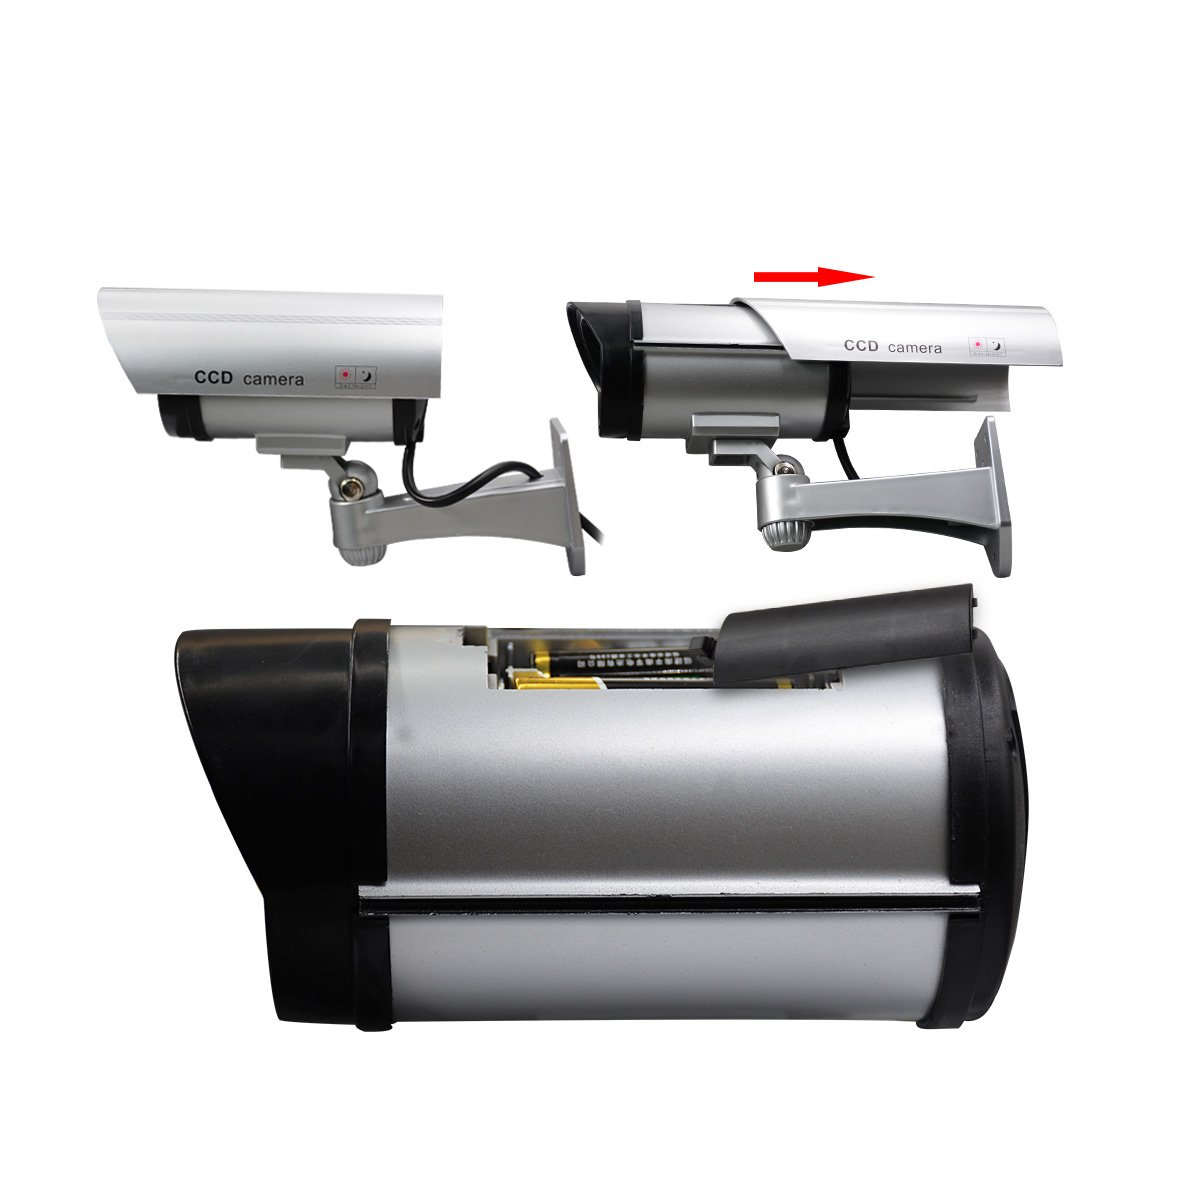 JOOAN CCTV Security Fake//Dummy Camera Outdoor Bullet Camera with 30 Units Illuminating LEDs